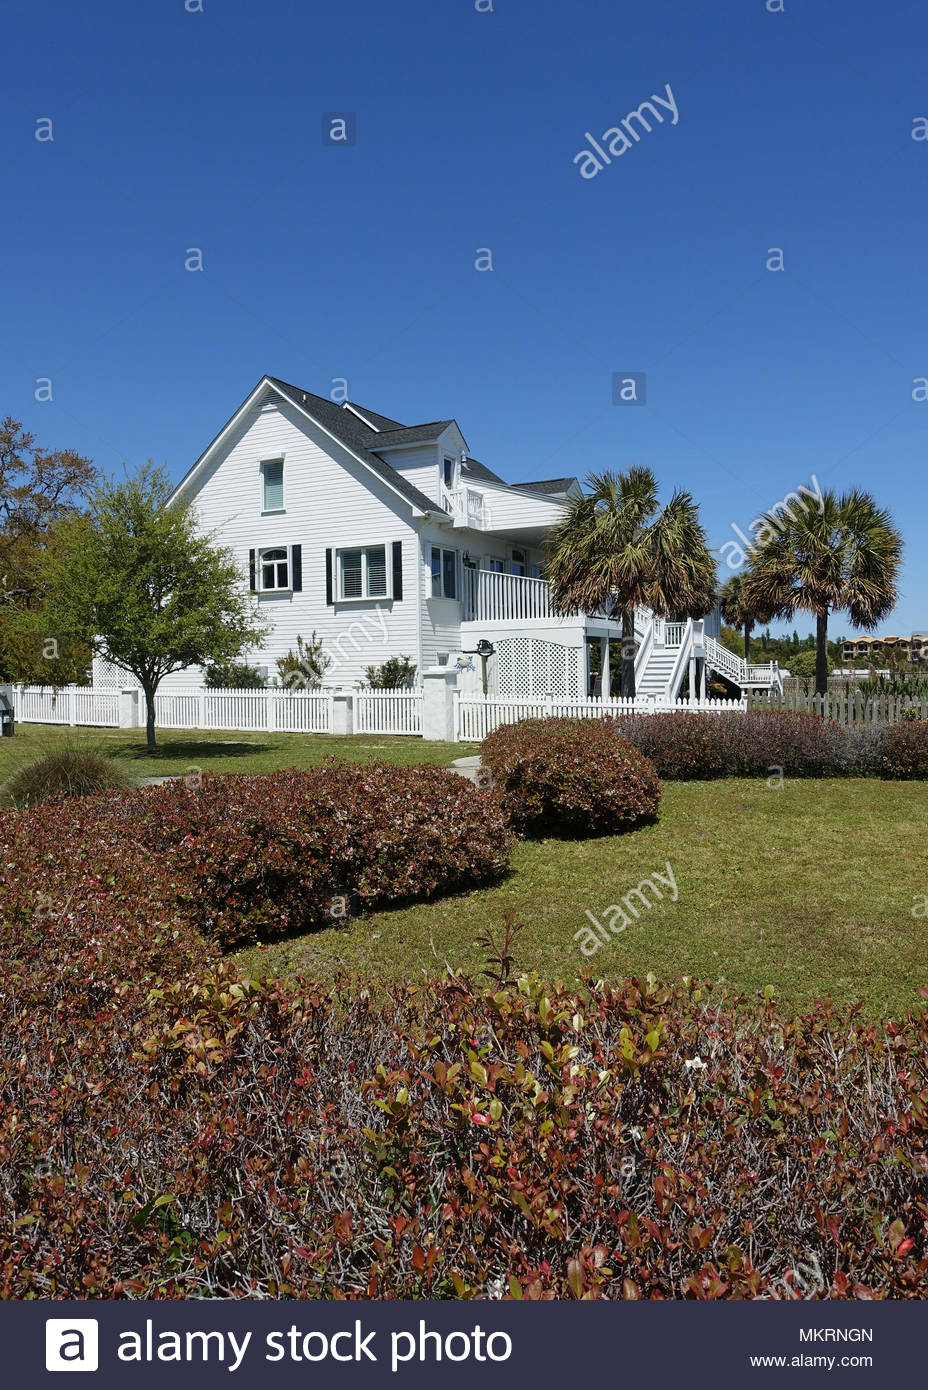 Home in Southport, North Carolina Stock Photo